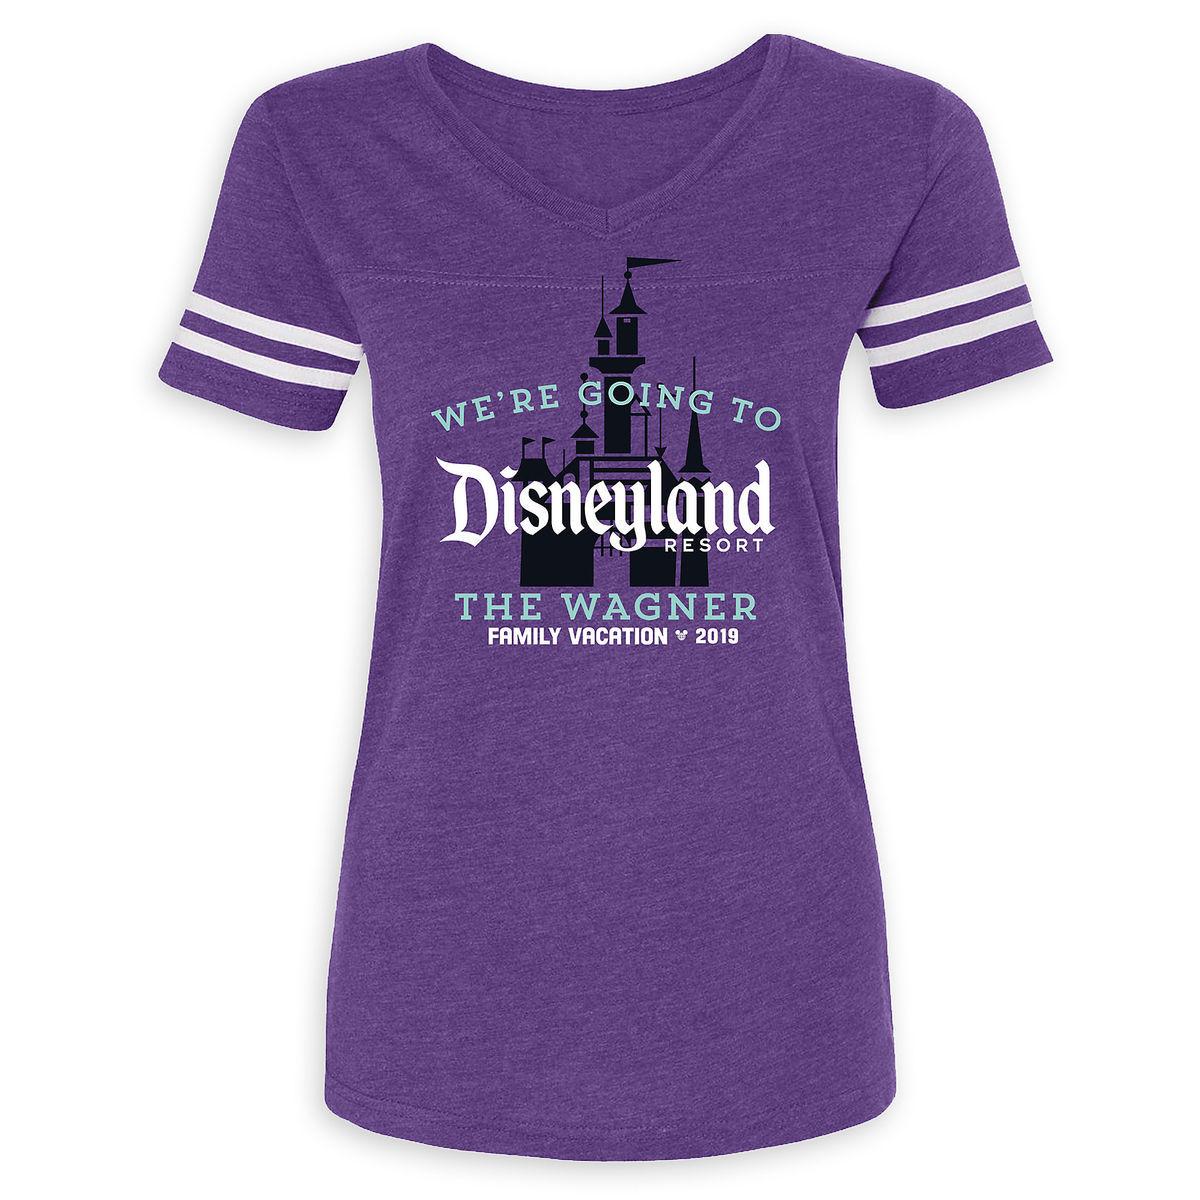 Thumbnail Image of Disneyland 2019 Family Vacation T-Shirt for Women - Customized # 1